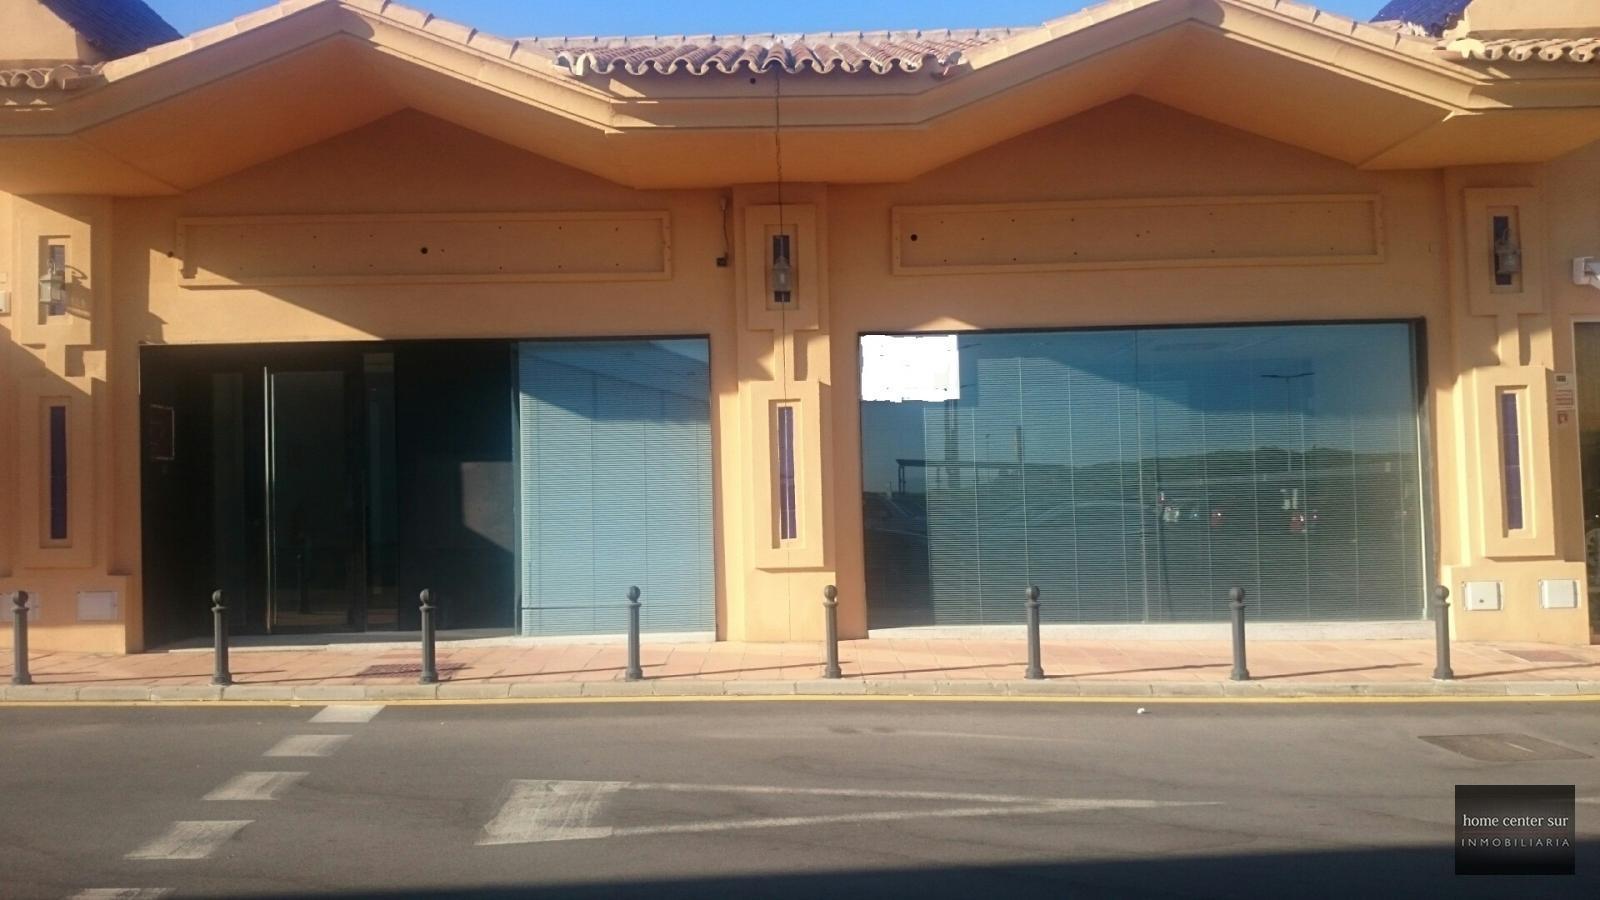 Oficina en alquiler en Via Ue C4 Calahonda 4 (Mijas Costa), 3.600 €/mes